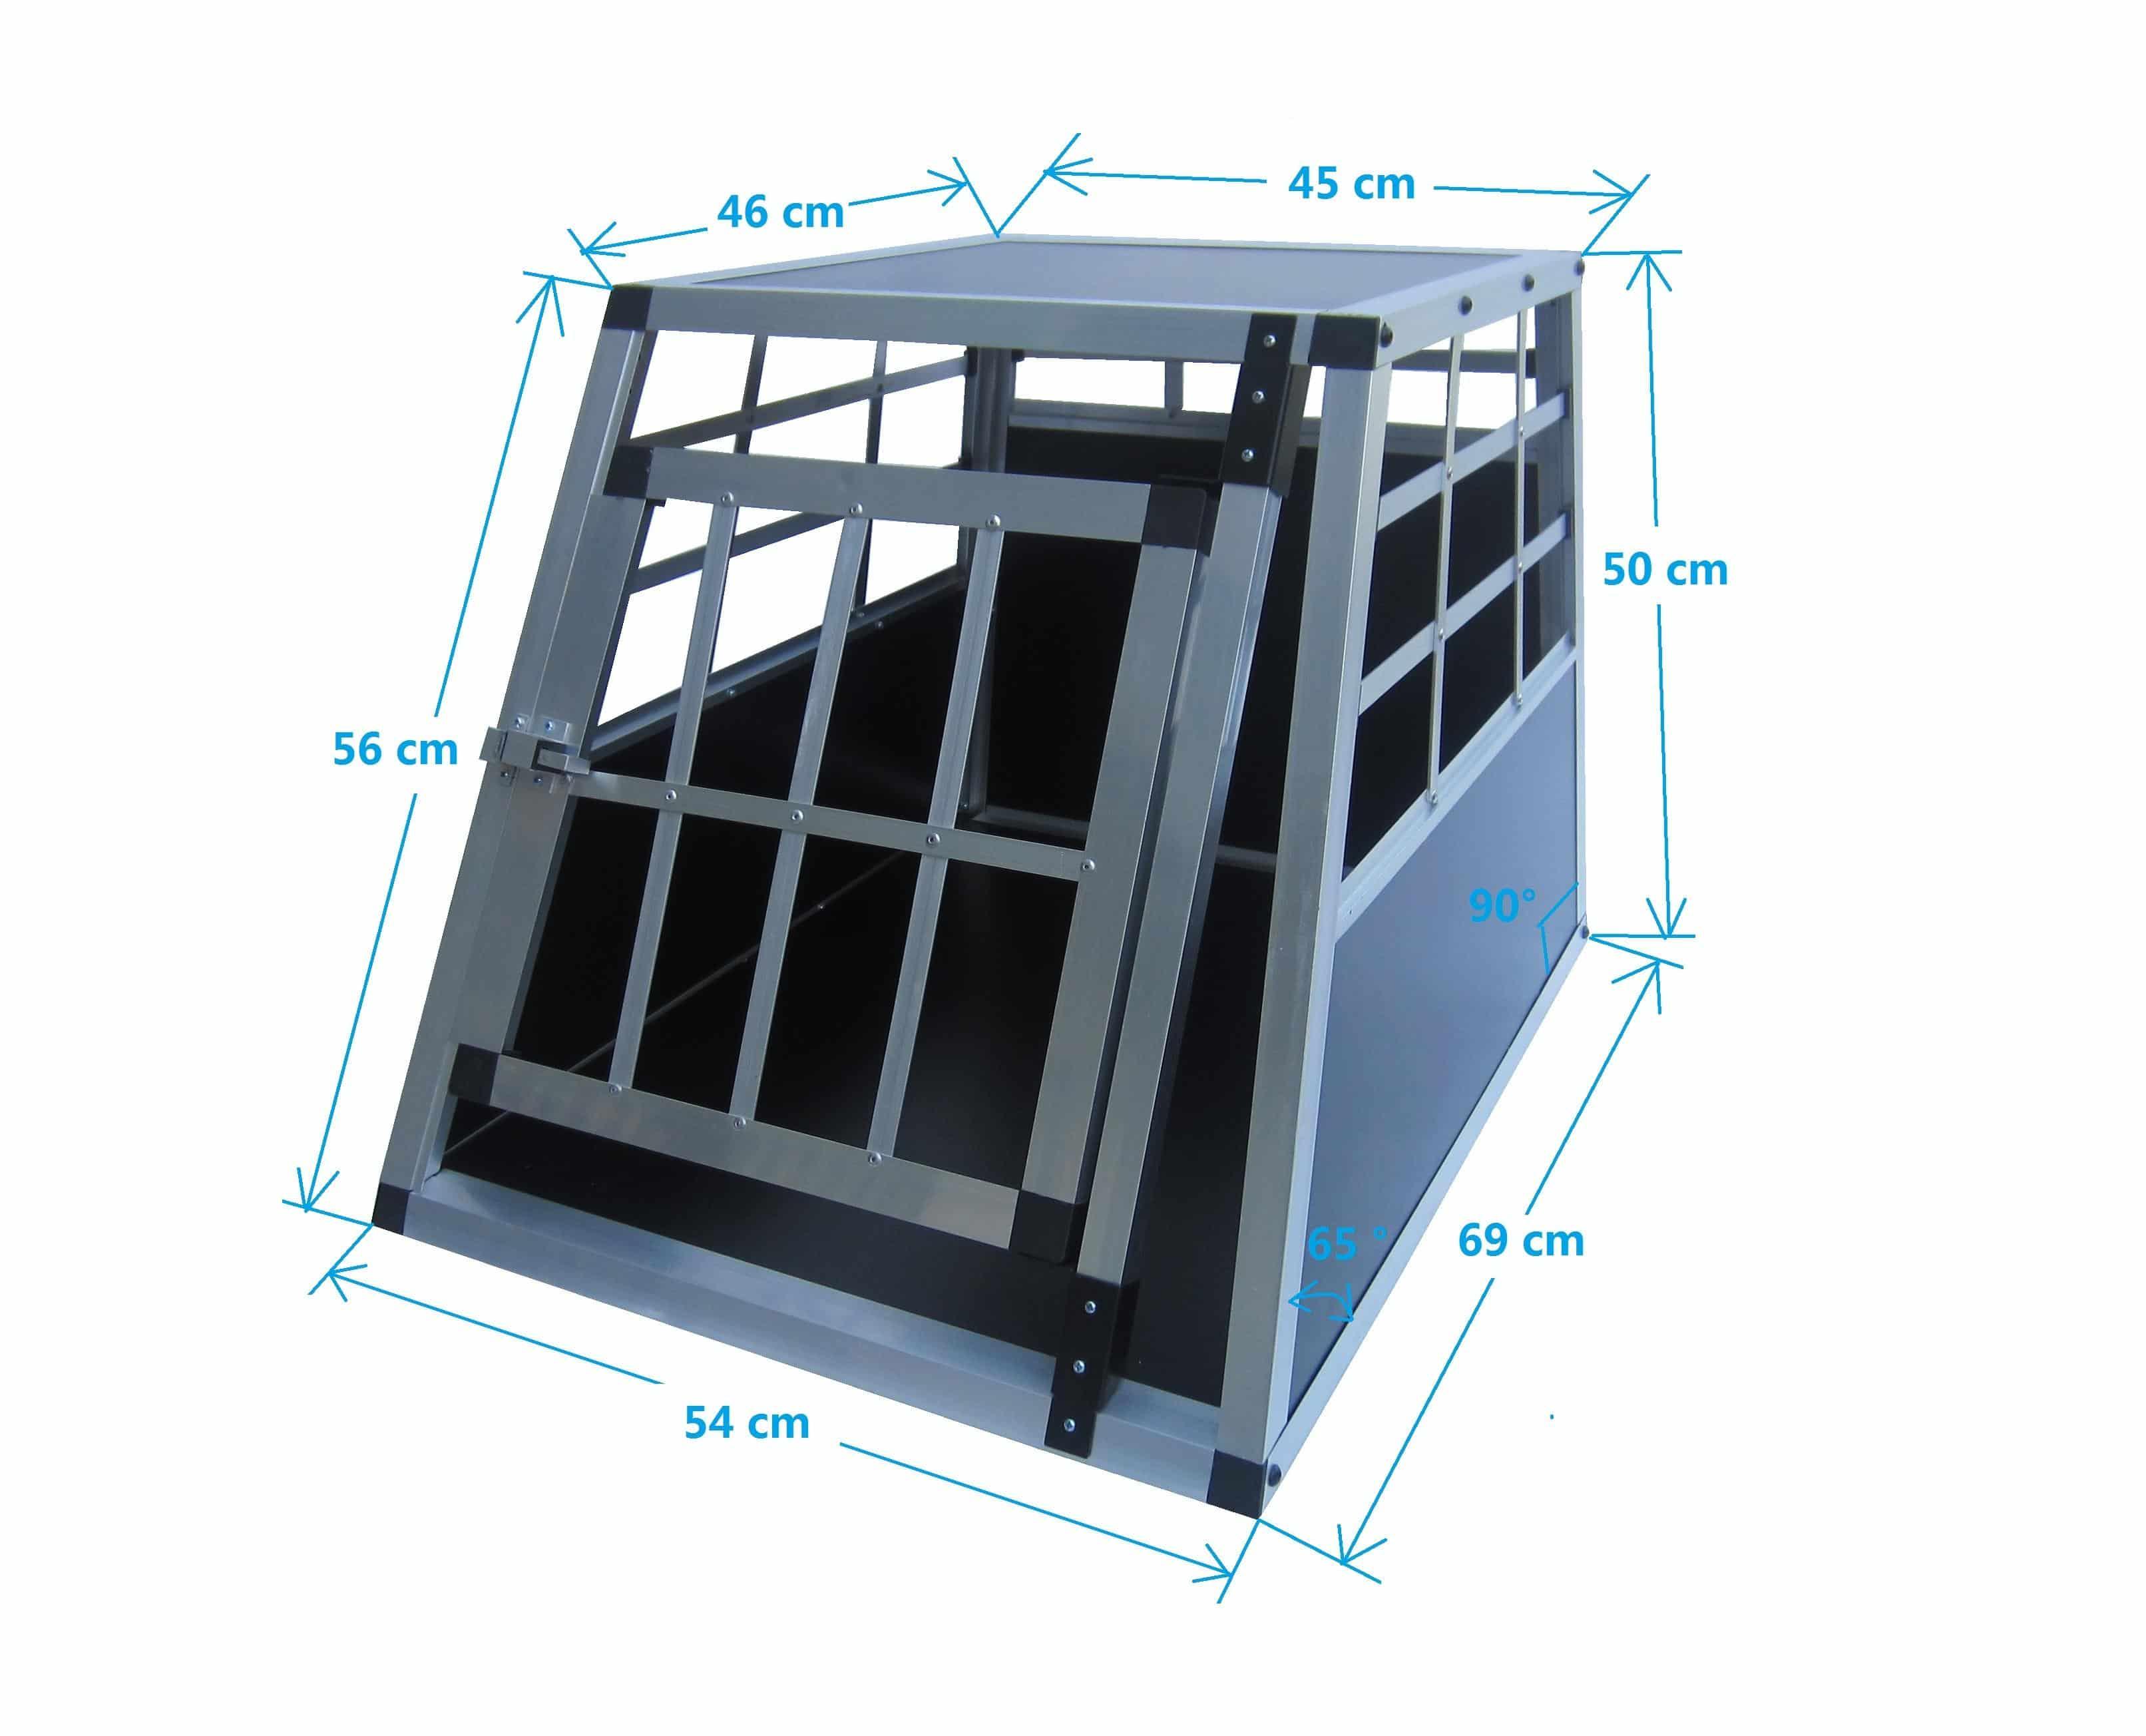 4animalz aluminium Hondenbench Small - 69 x 54 x 50 cm - 1 deur